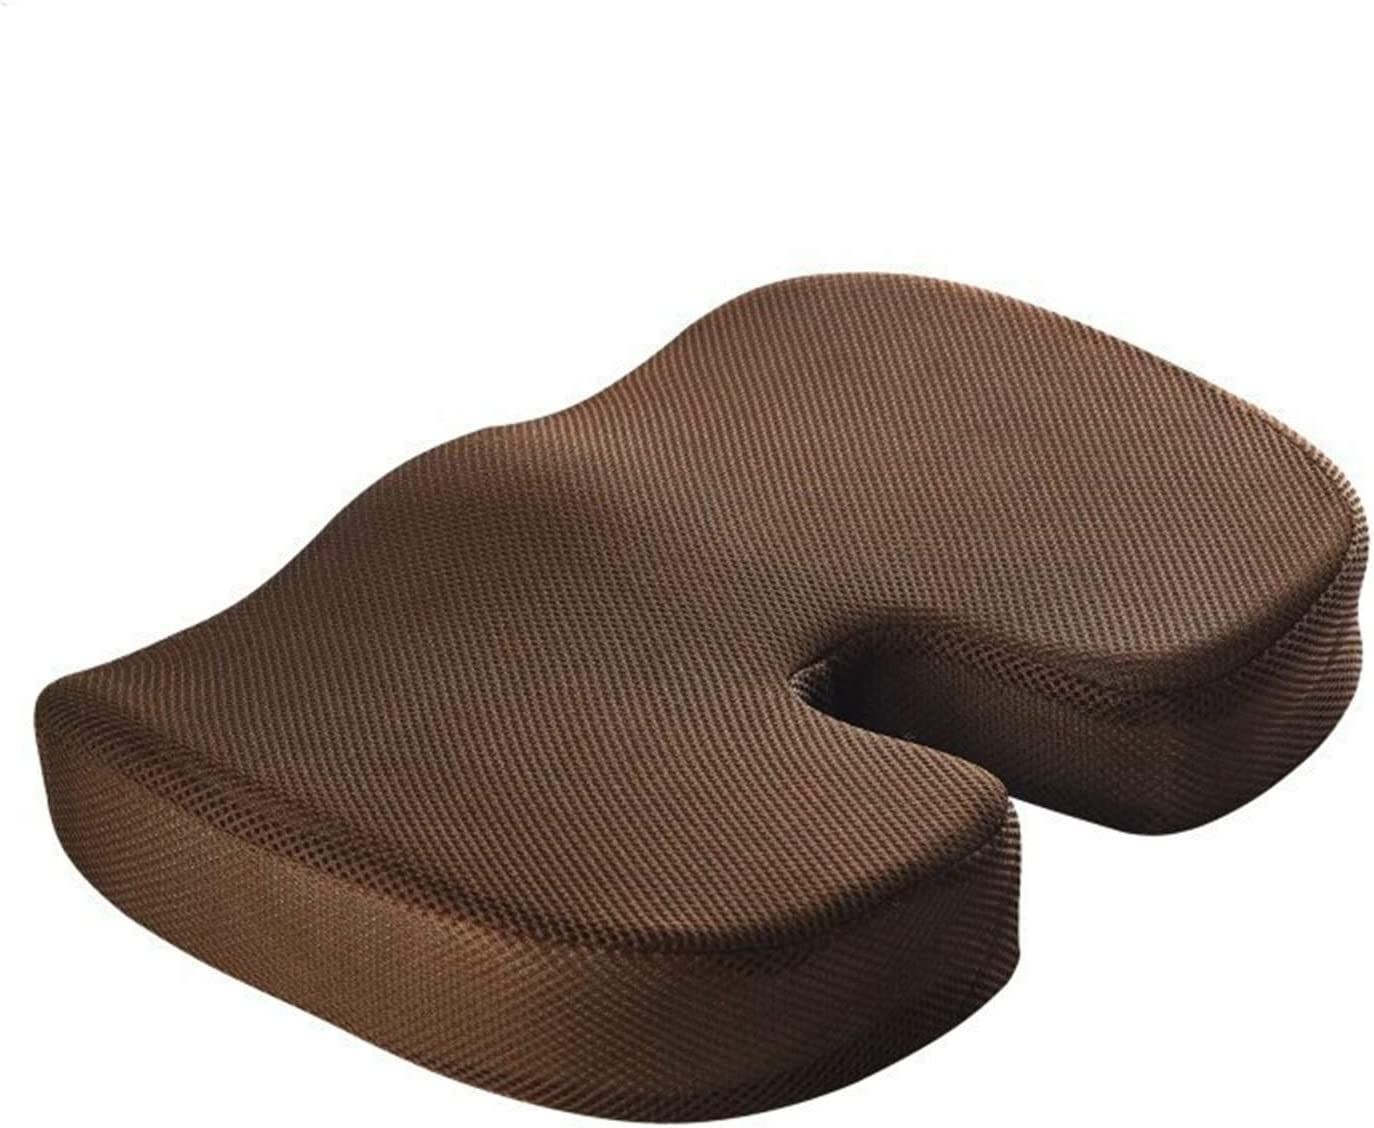 jianchi Travel Breathable Seat Coccyx Cushion Arlington Superlatite Mall Orthopedic Memory